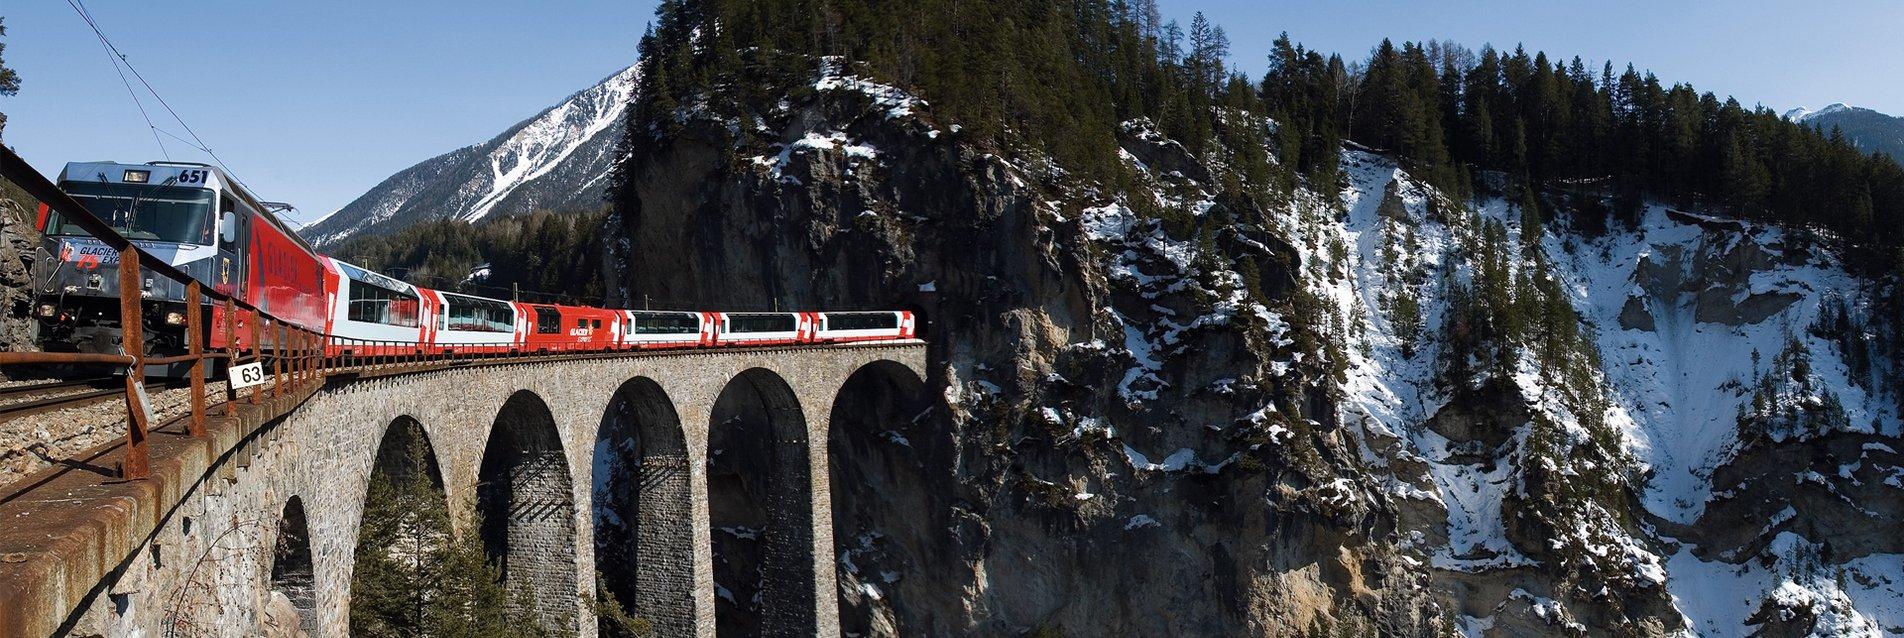 Glacier Express - Route